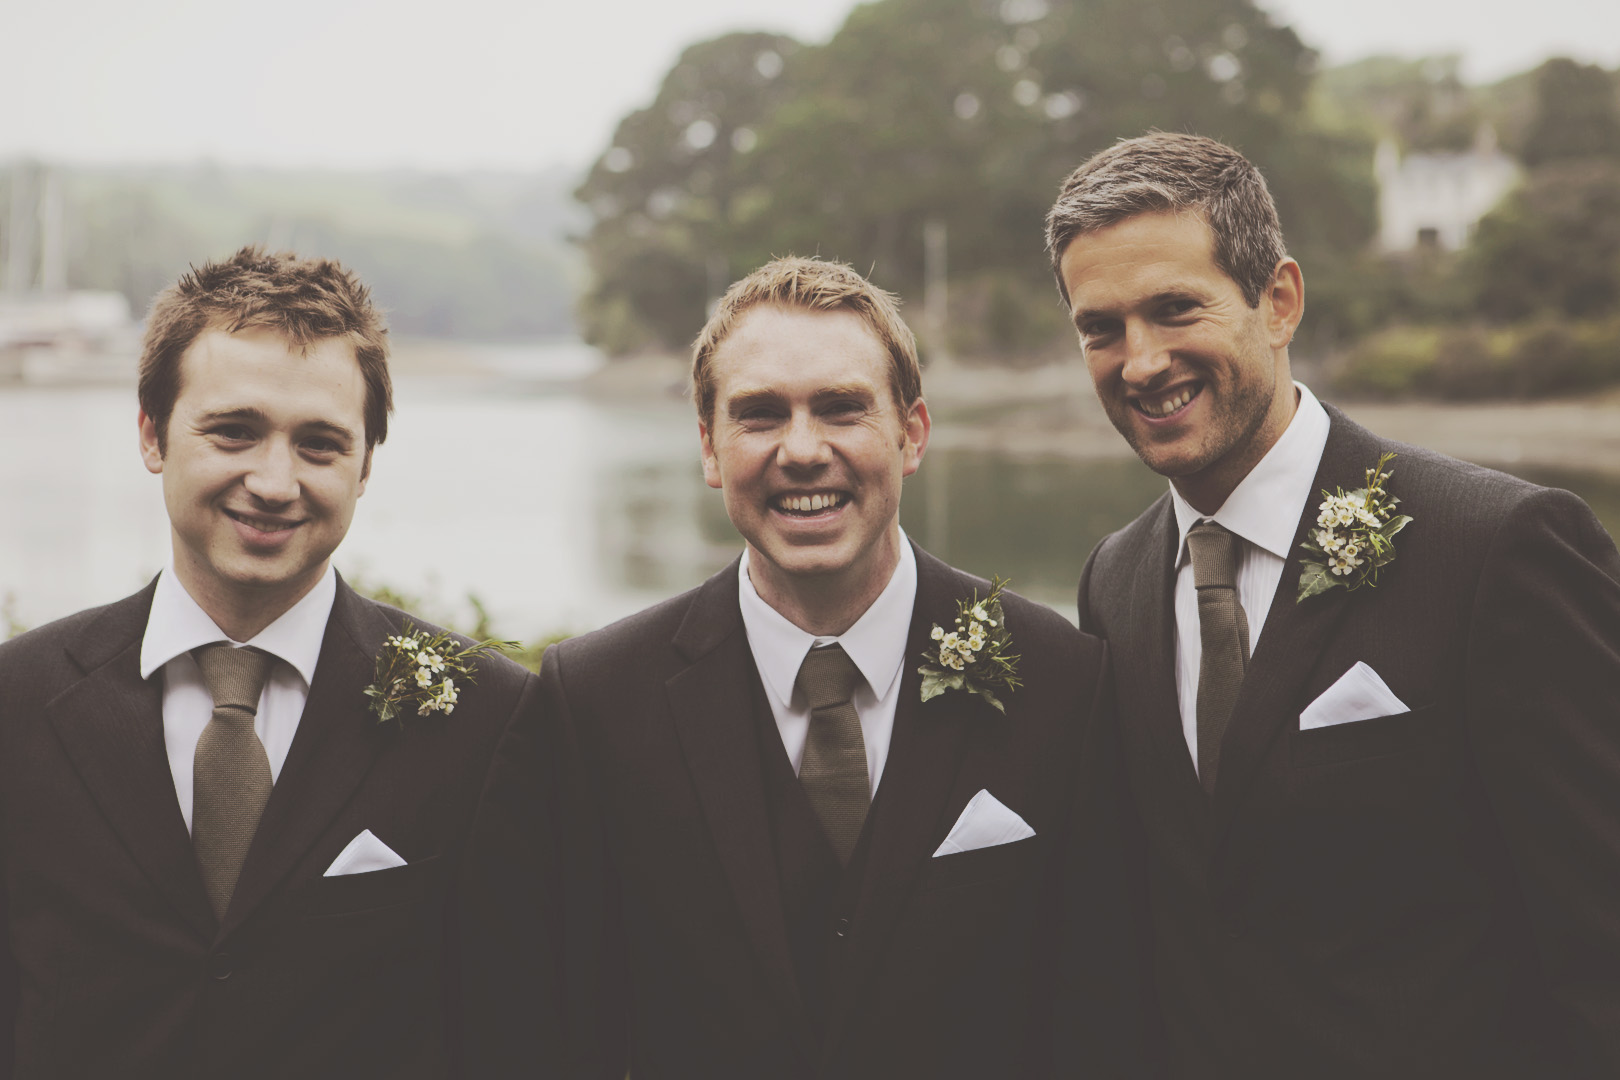 wedding_280913_4842